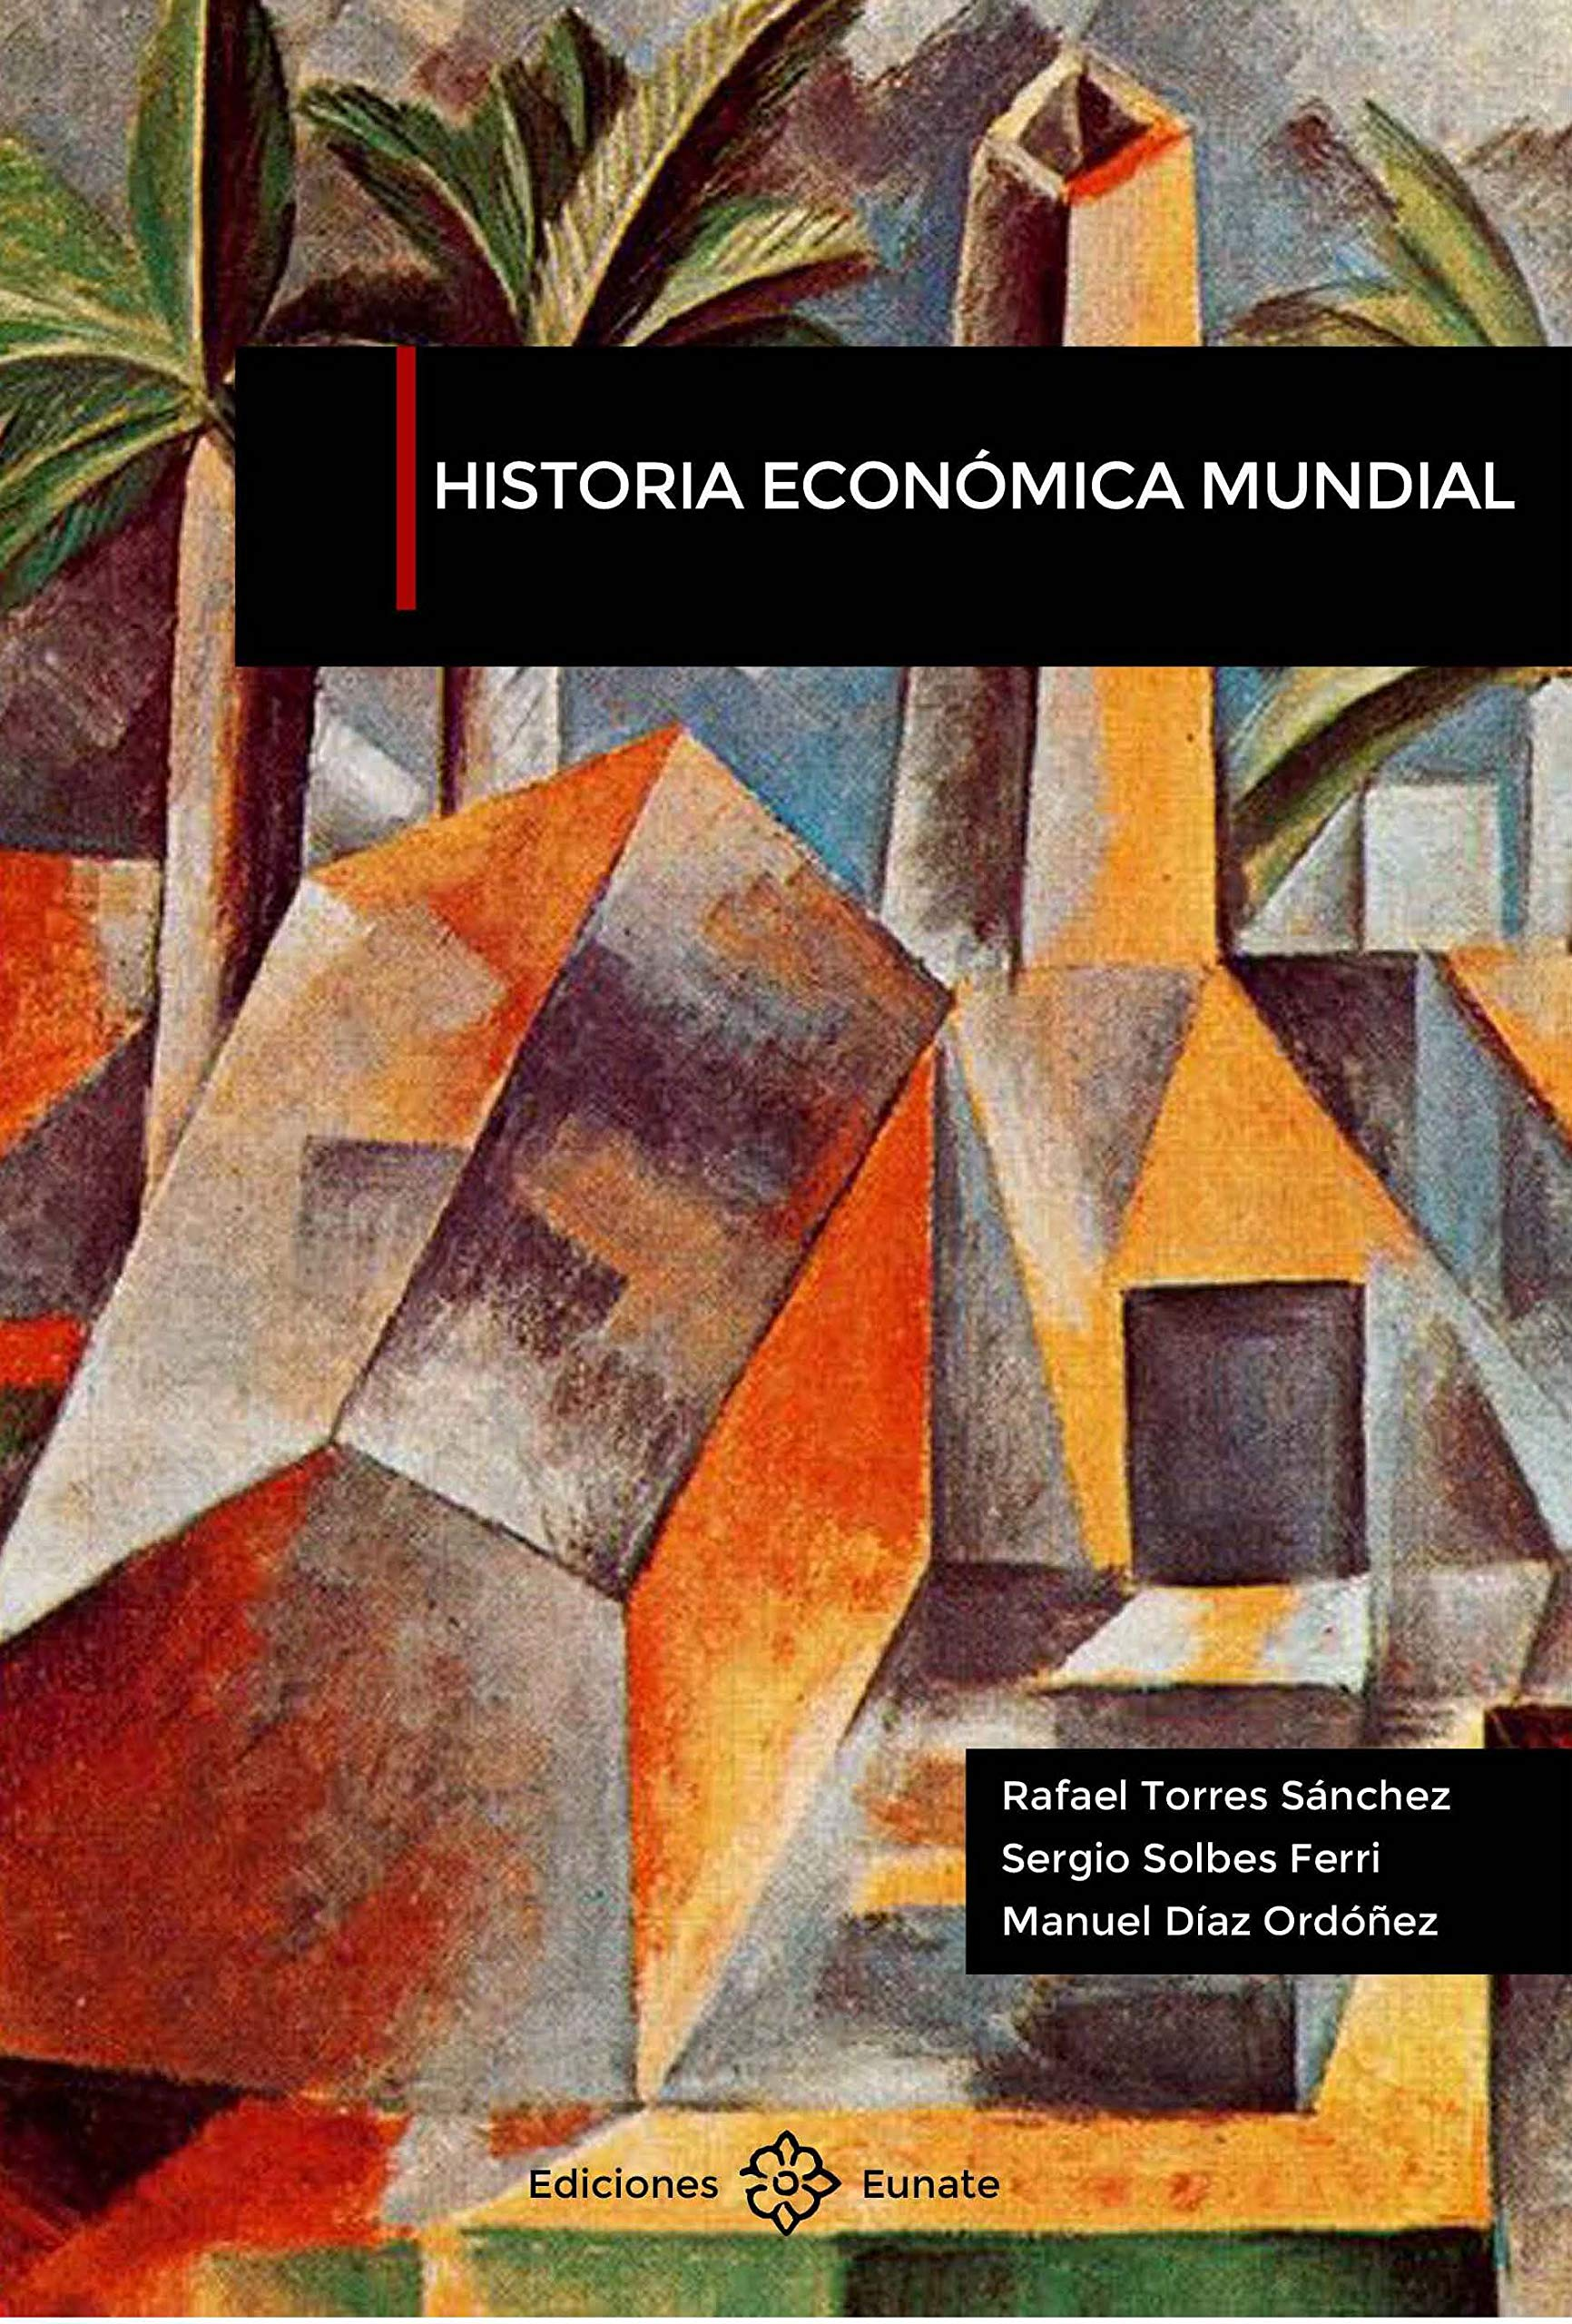 Historia económica mundial (Spanish Edition)